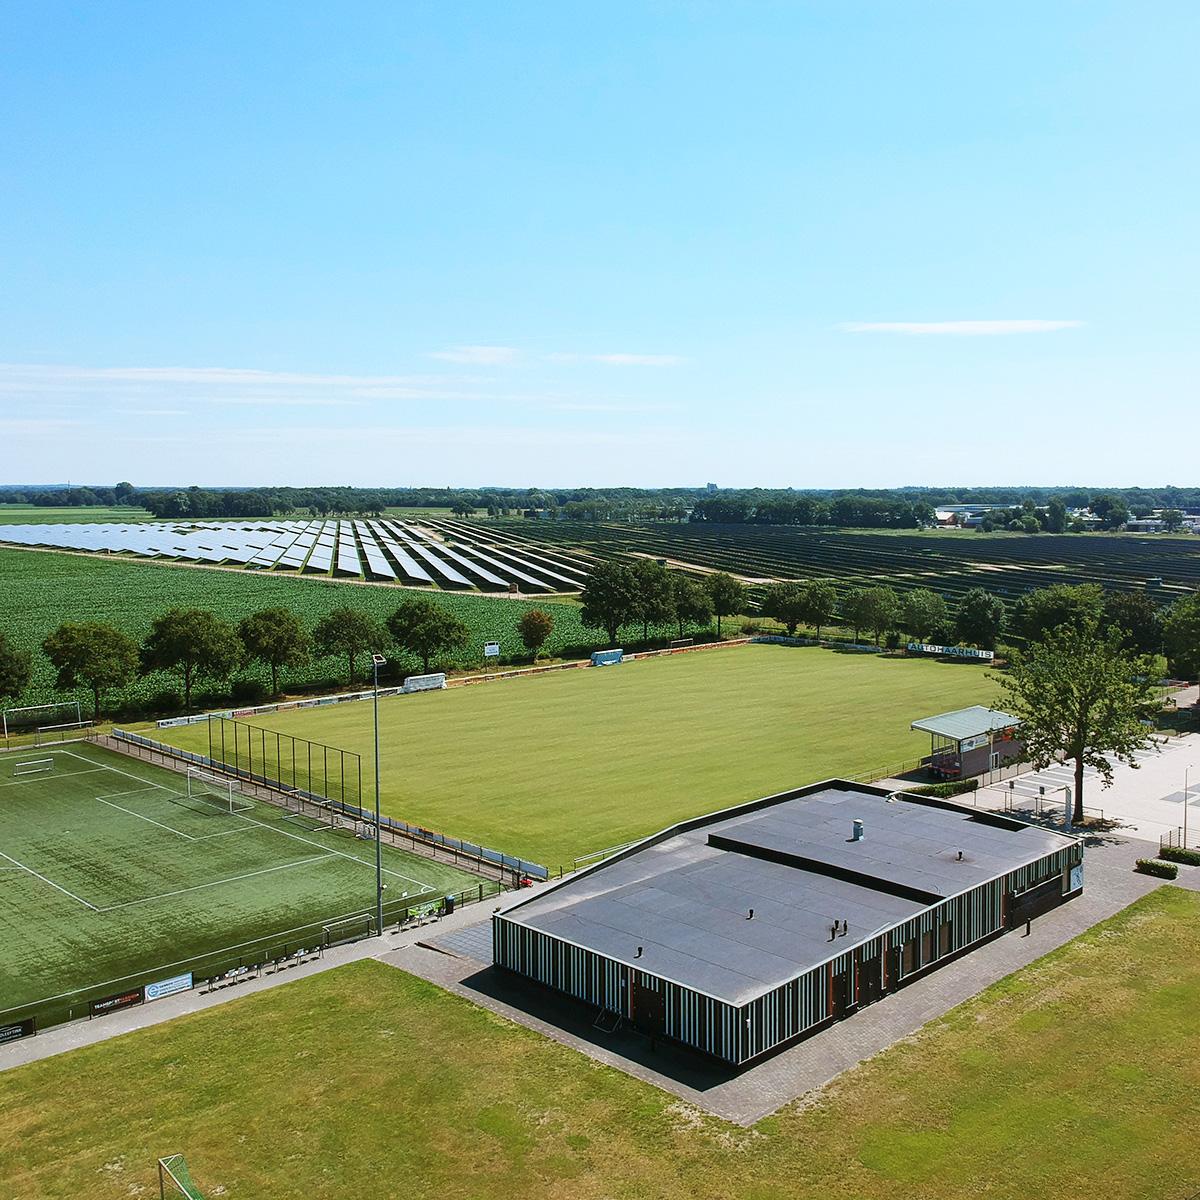 Zonnepark Aadijk Almelo Voetbalclub ASV'57